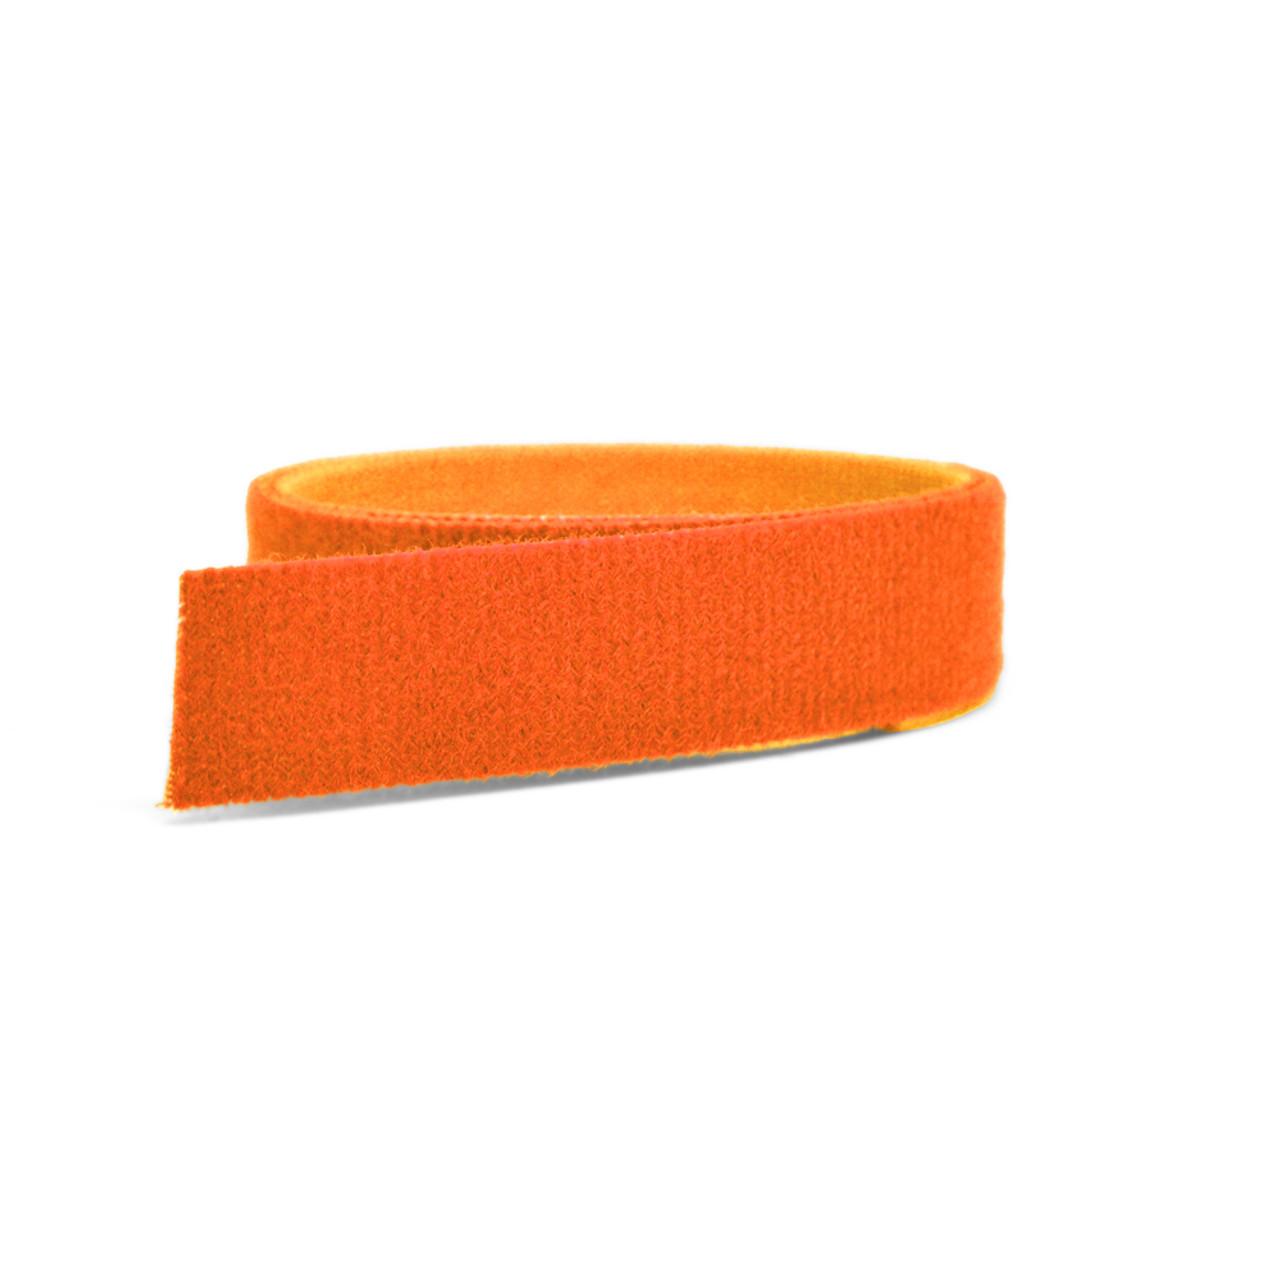 VELCRO® Brand ONE-WRAP® Tape Orange Mini Rolls / Velcro Straps - Bundling Straps - Velcro Tie - Velcro Strap